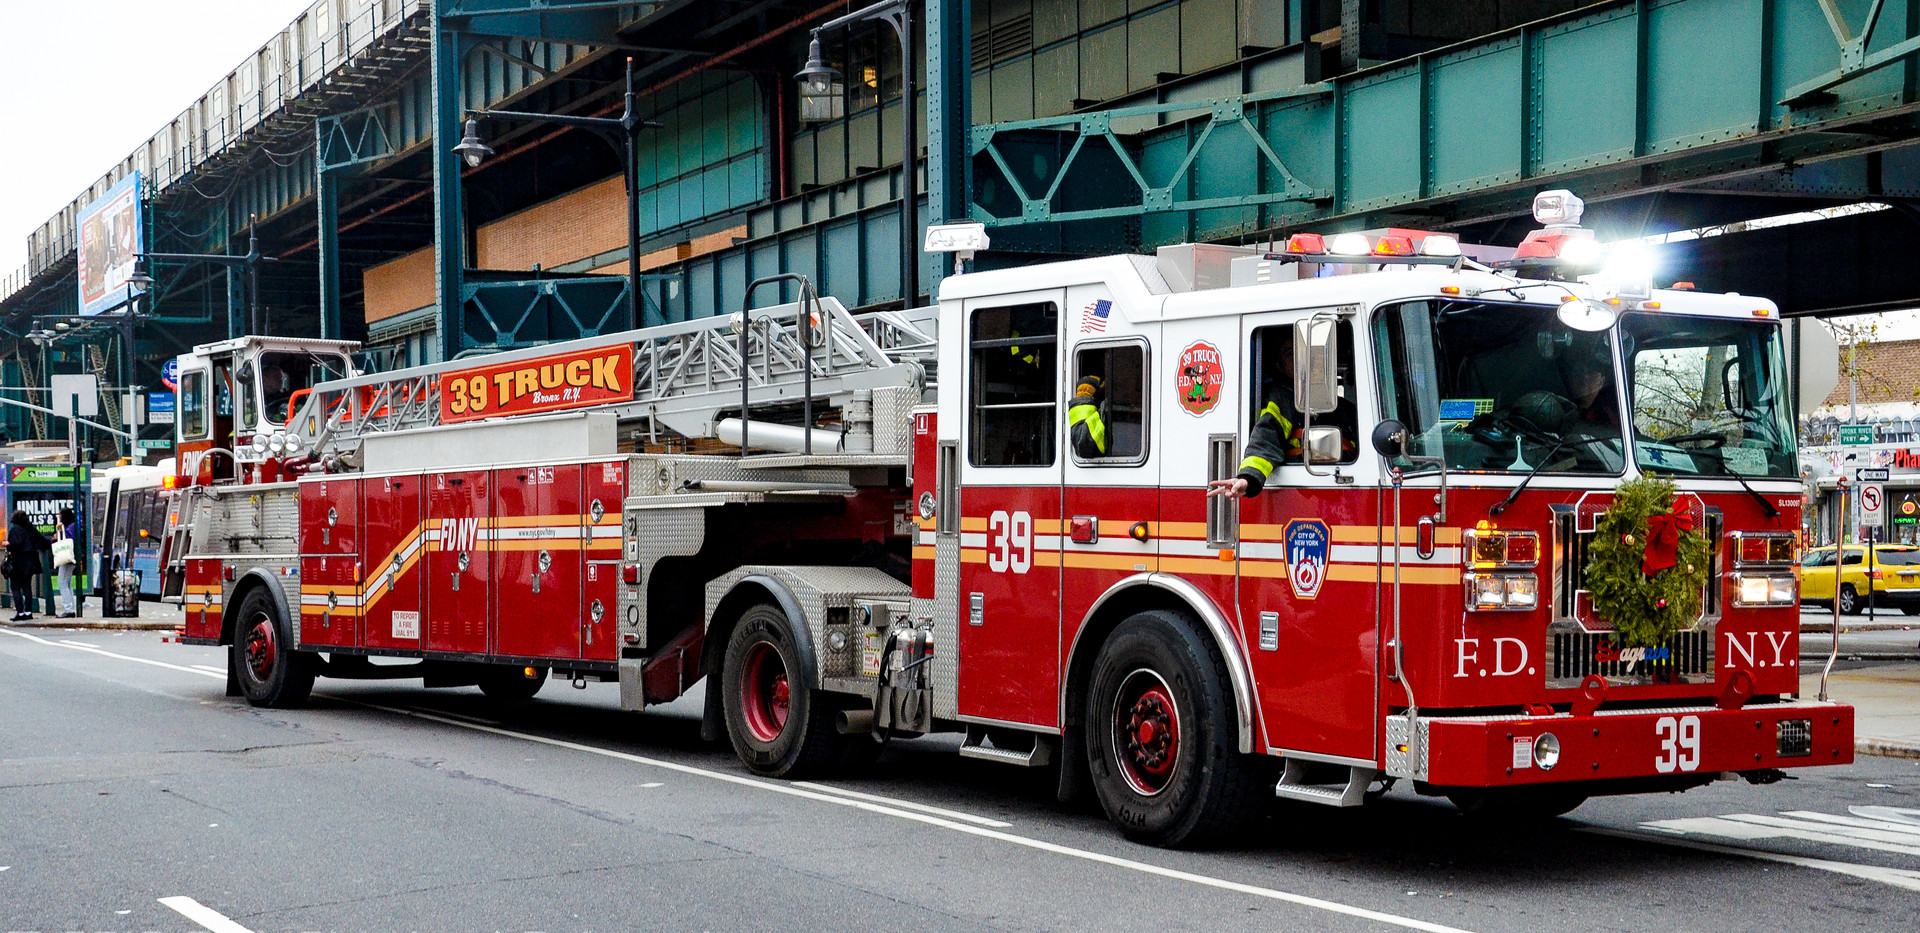 FDNY 39 Truck